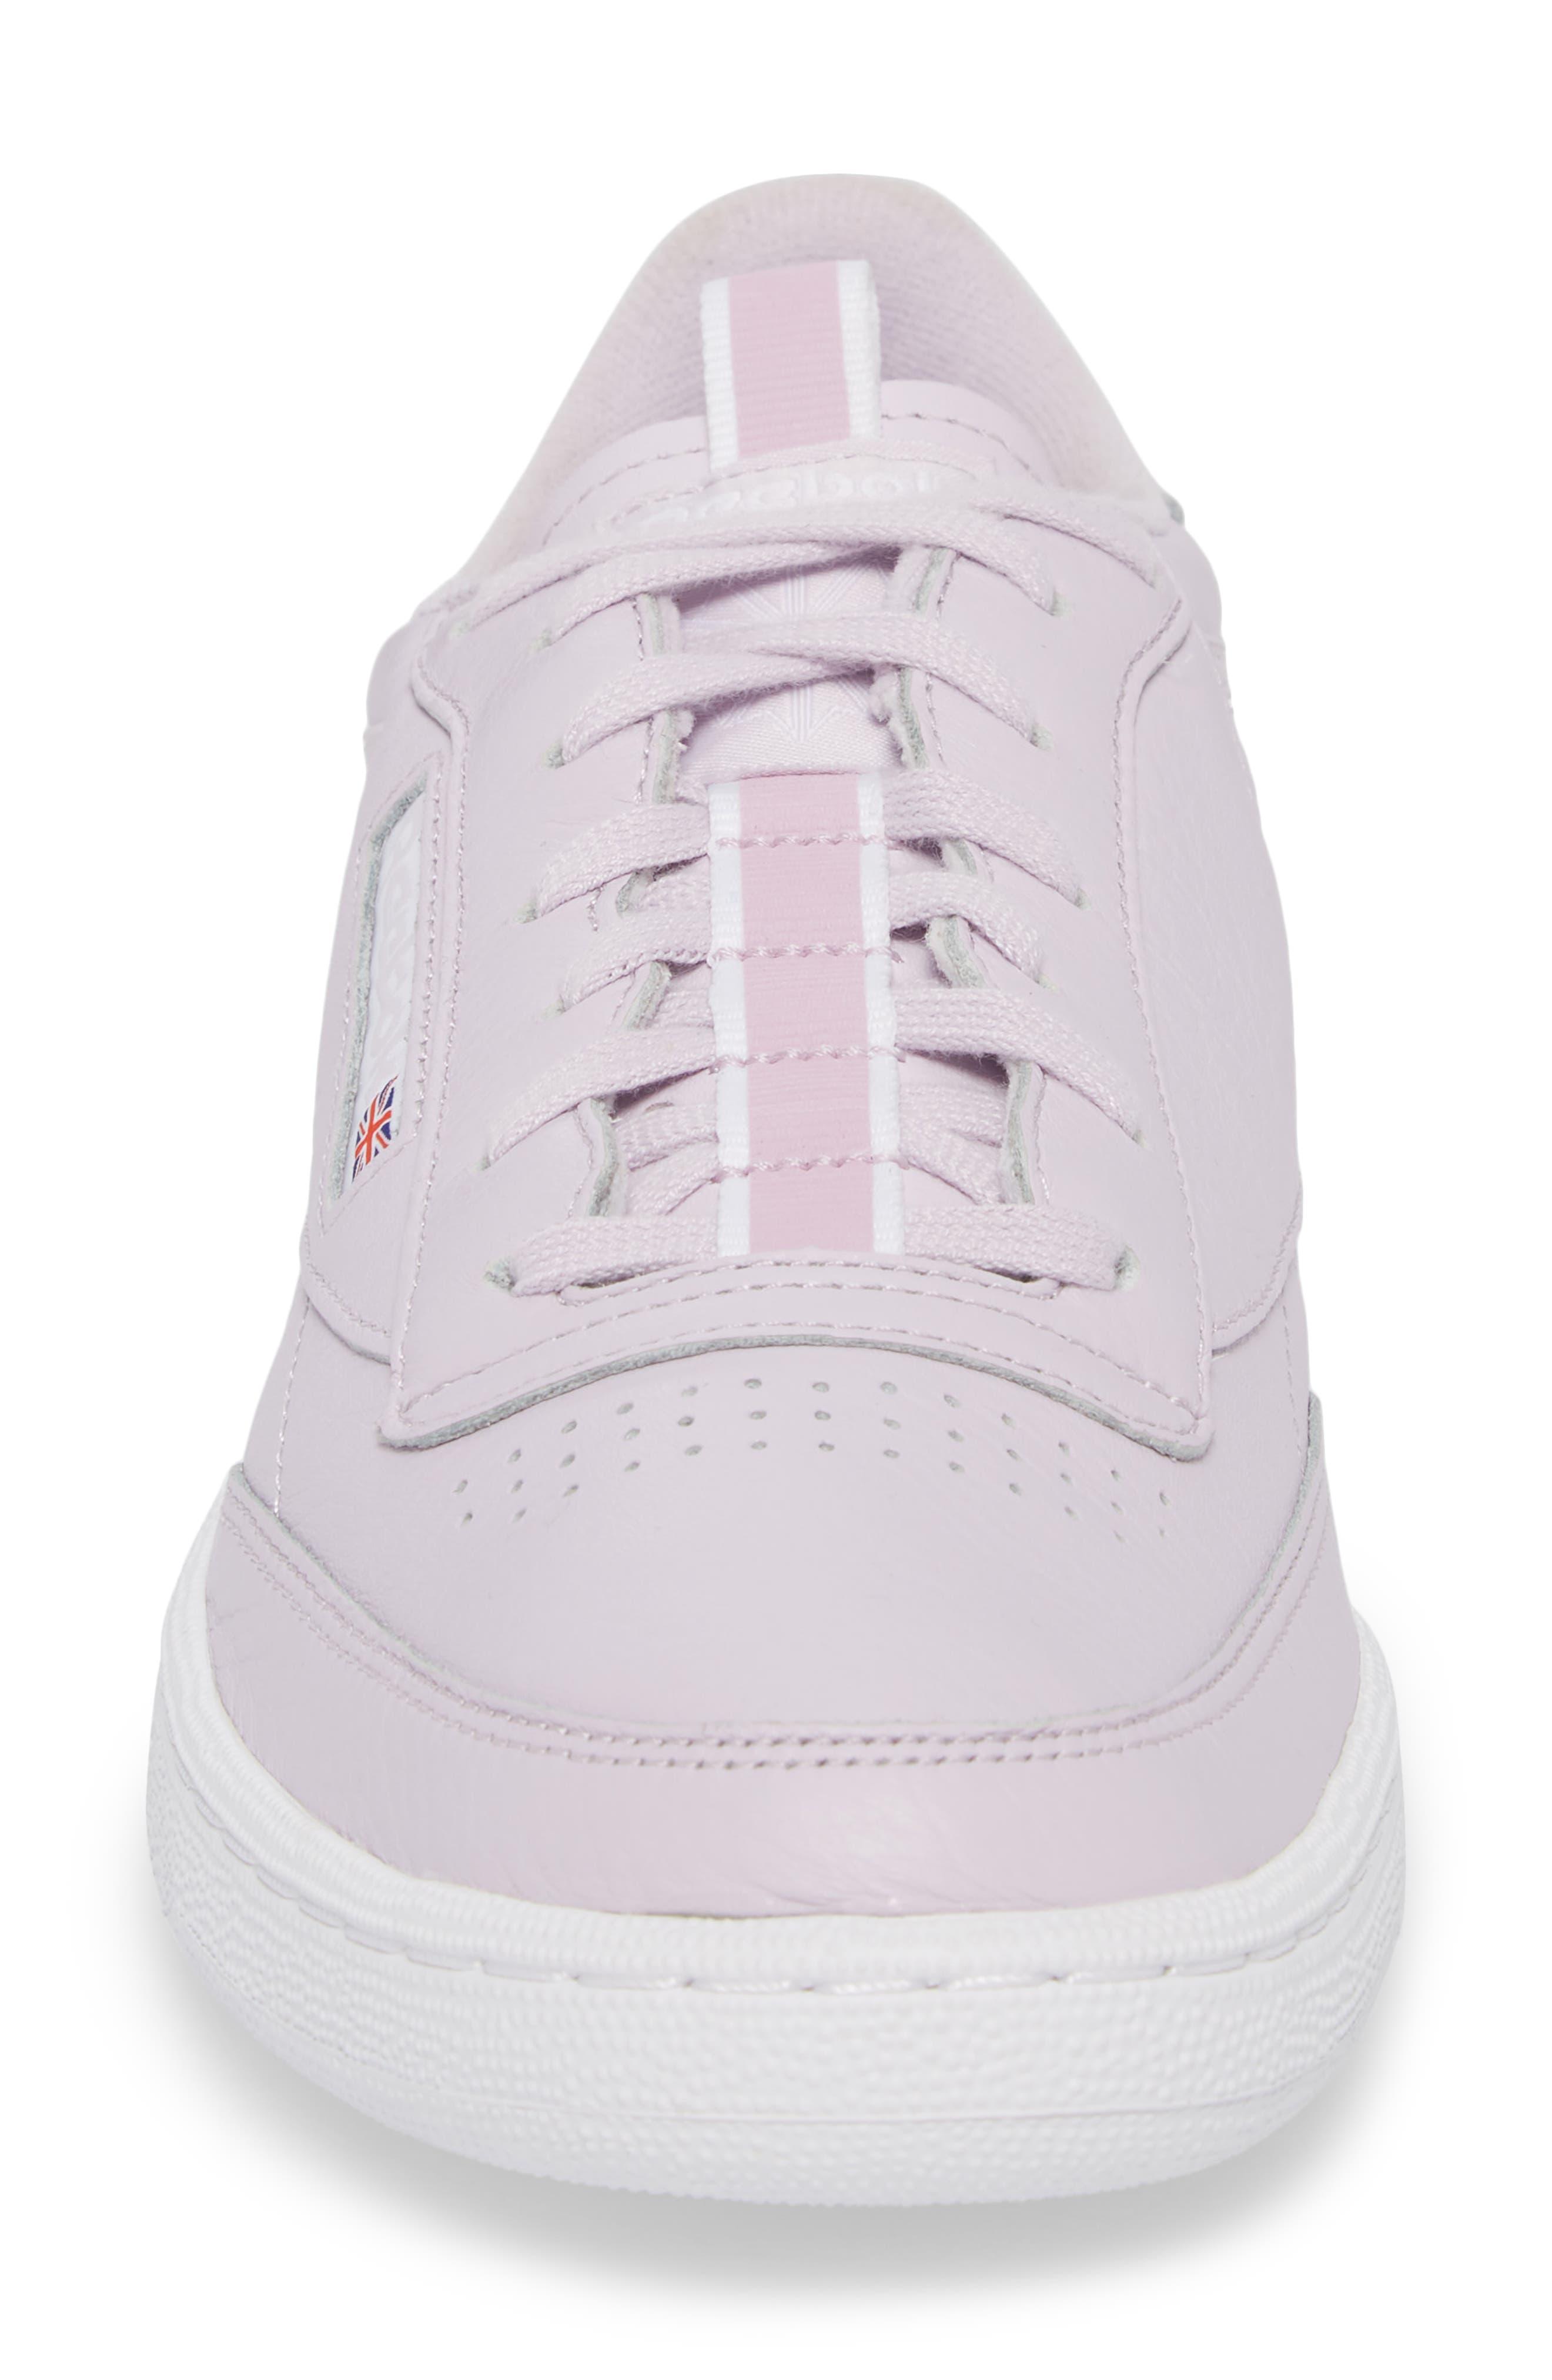 Club C 85 RT Sneaker,                             Alternate thumbnail 4, color,                             Quartz/ White/ Purple Fog